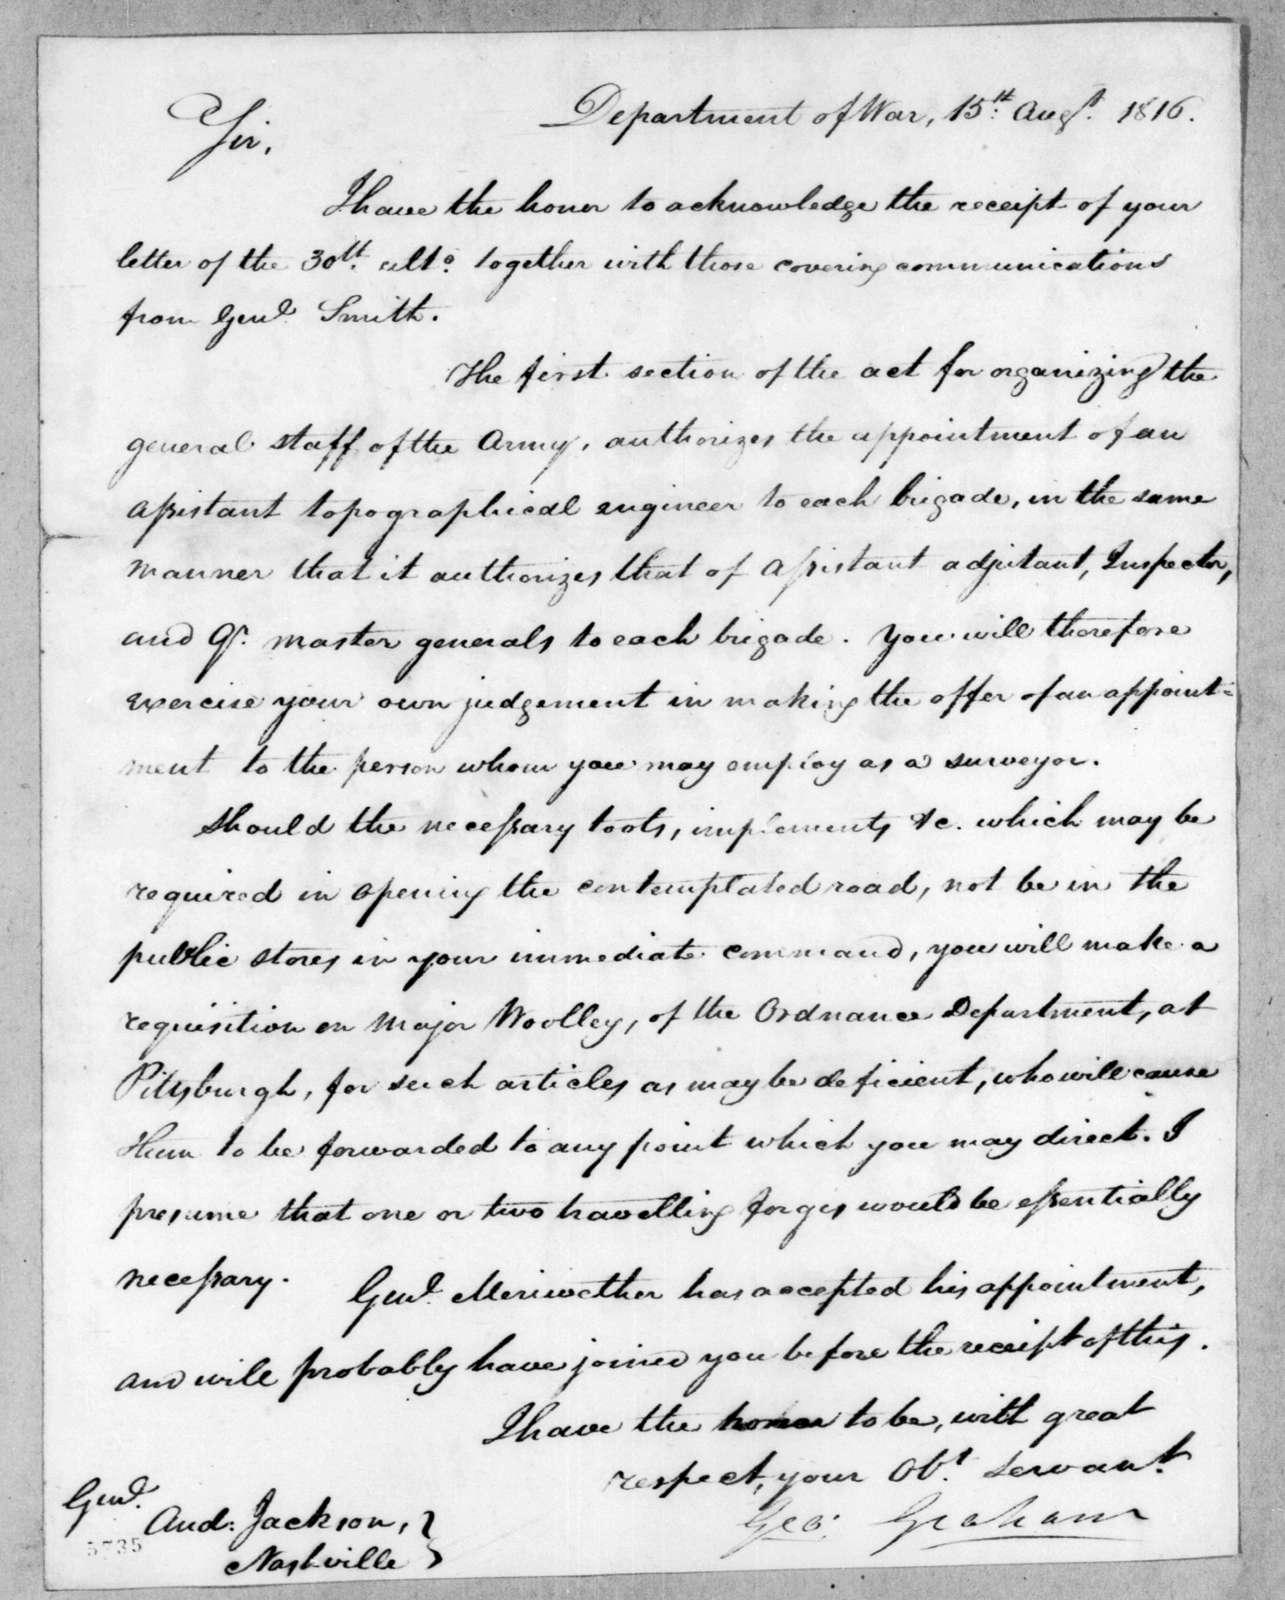 George Graham to Andrew Jackson, August 15, 1816